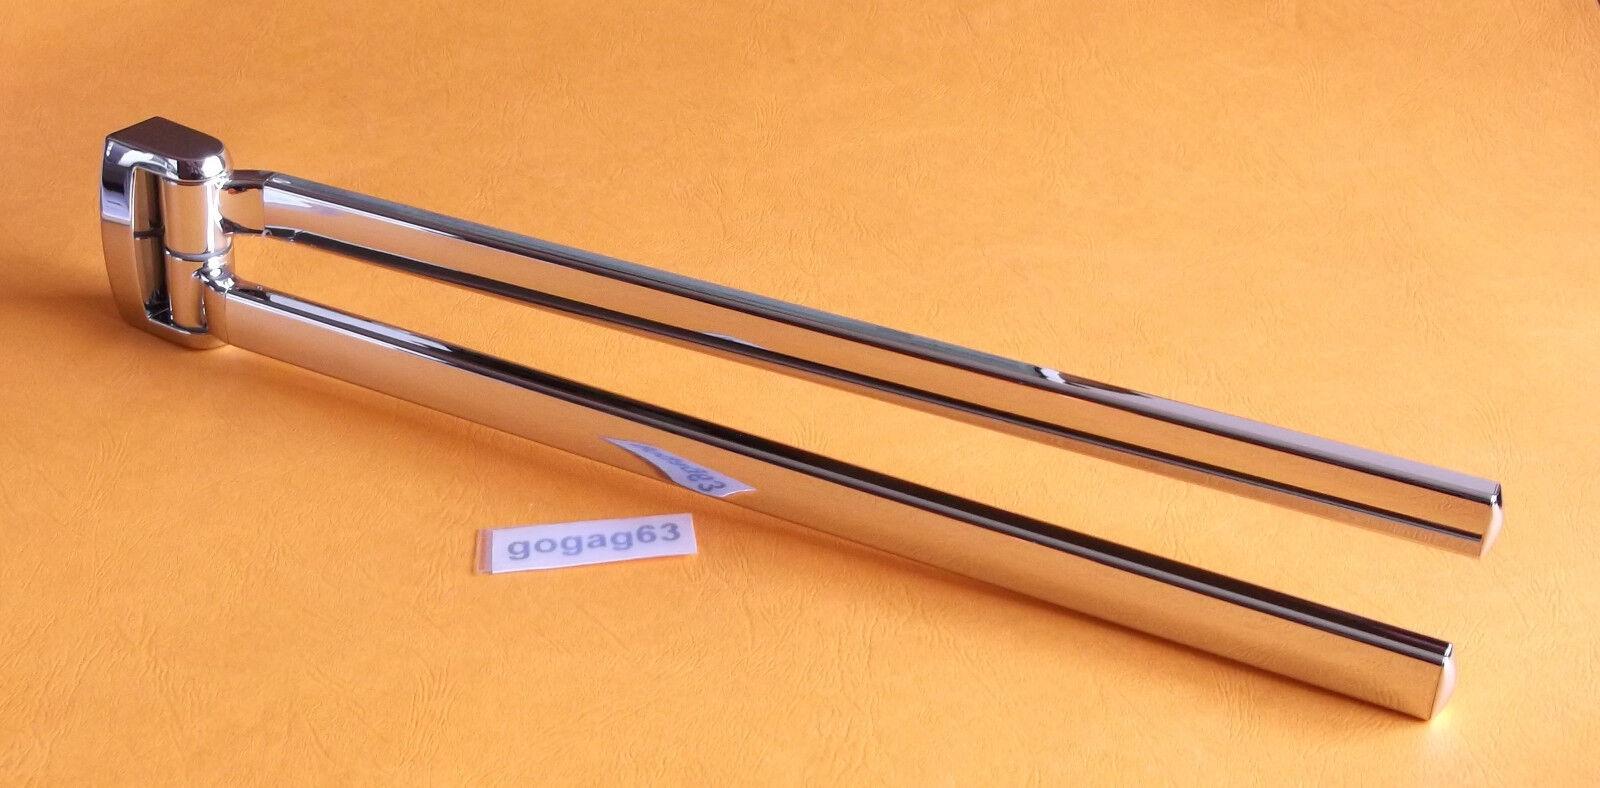 keuco elegance handtuchhalter 1618 eur 98 82 picclick de. Black Bedroom Furniture Sets. Home Design Ideas